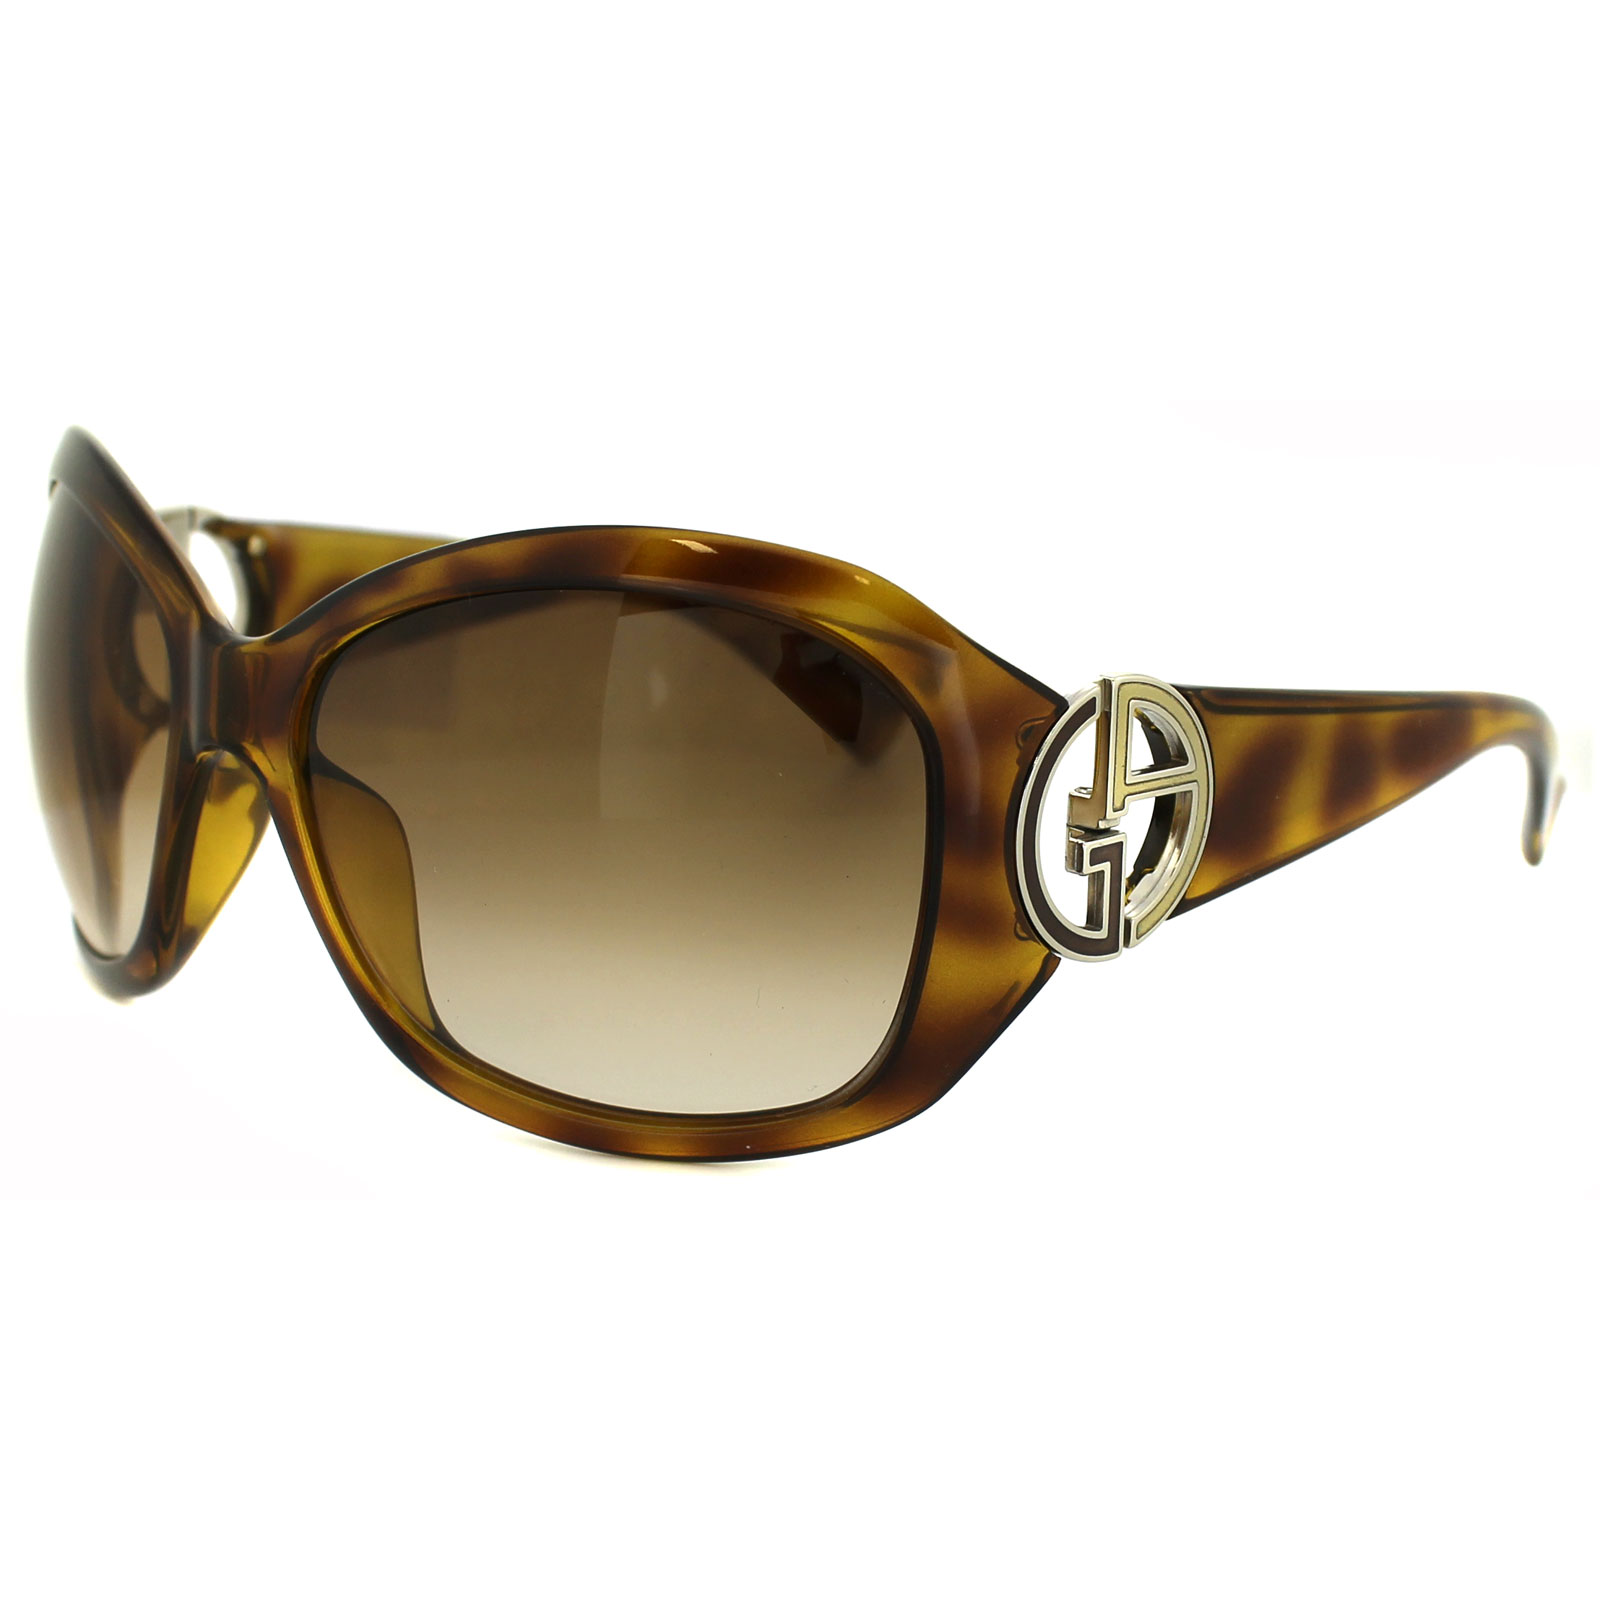 Cheap Giorgio Armani Sunglasses 556 Discounted Sunglasses